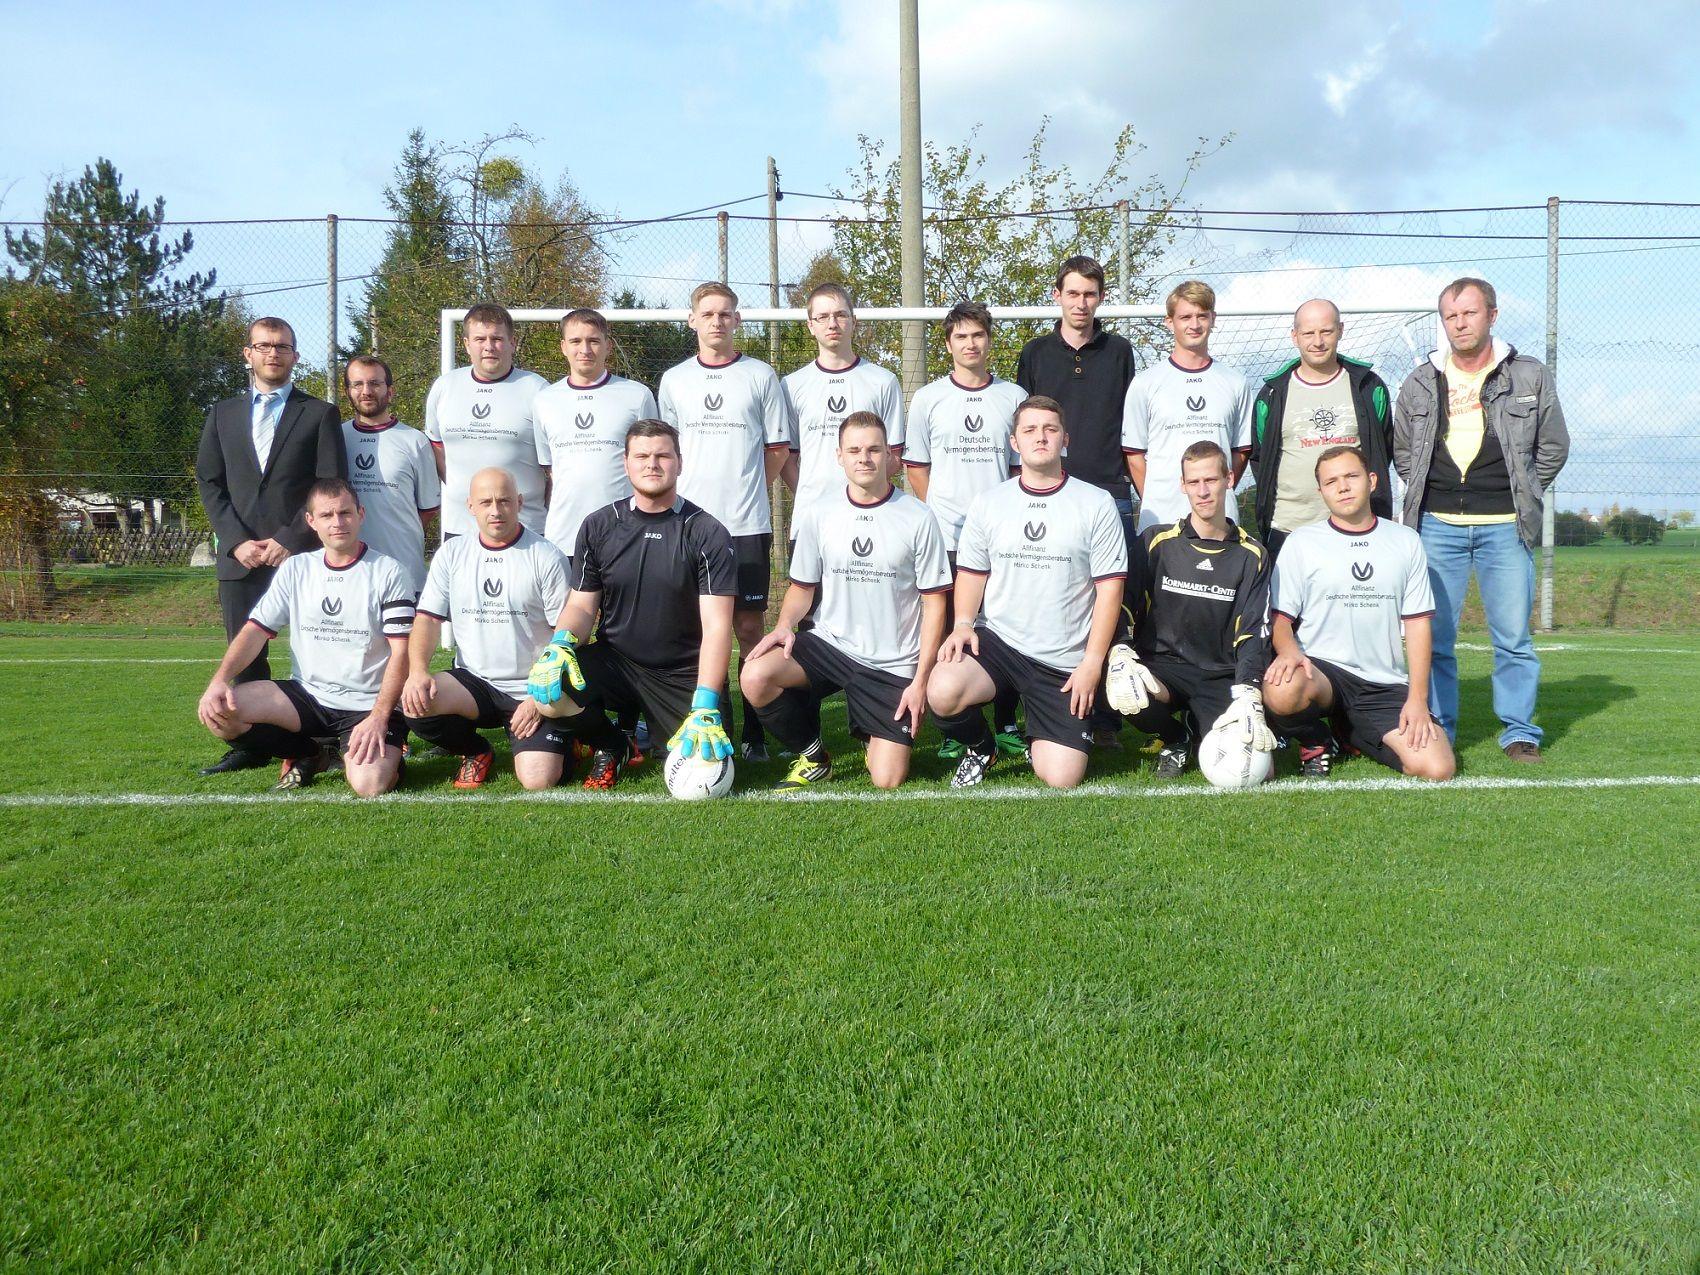 Männermannschaft 2014/2015 mit Sponsor